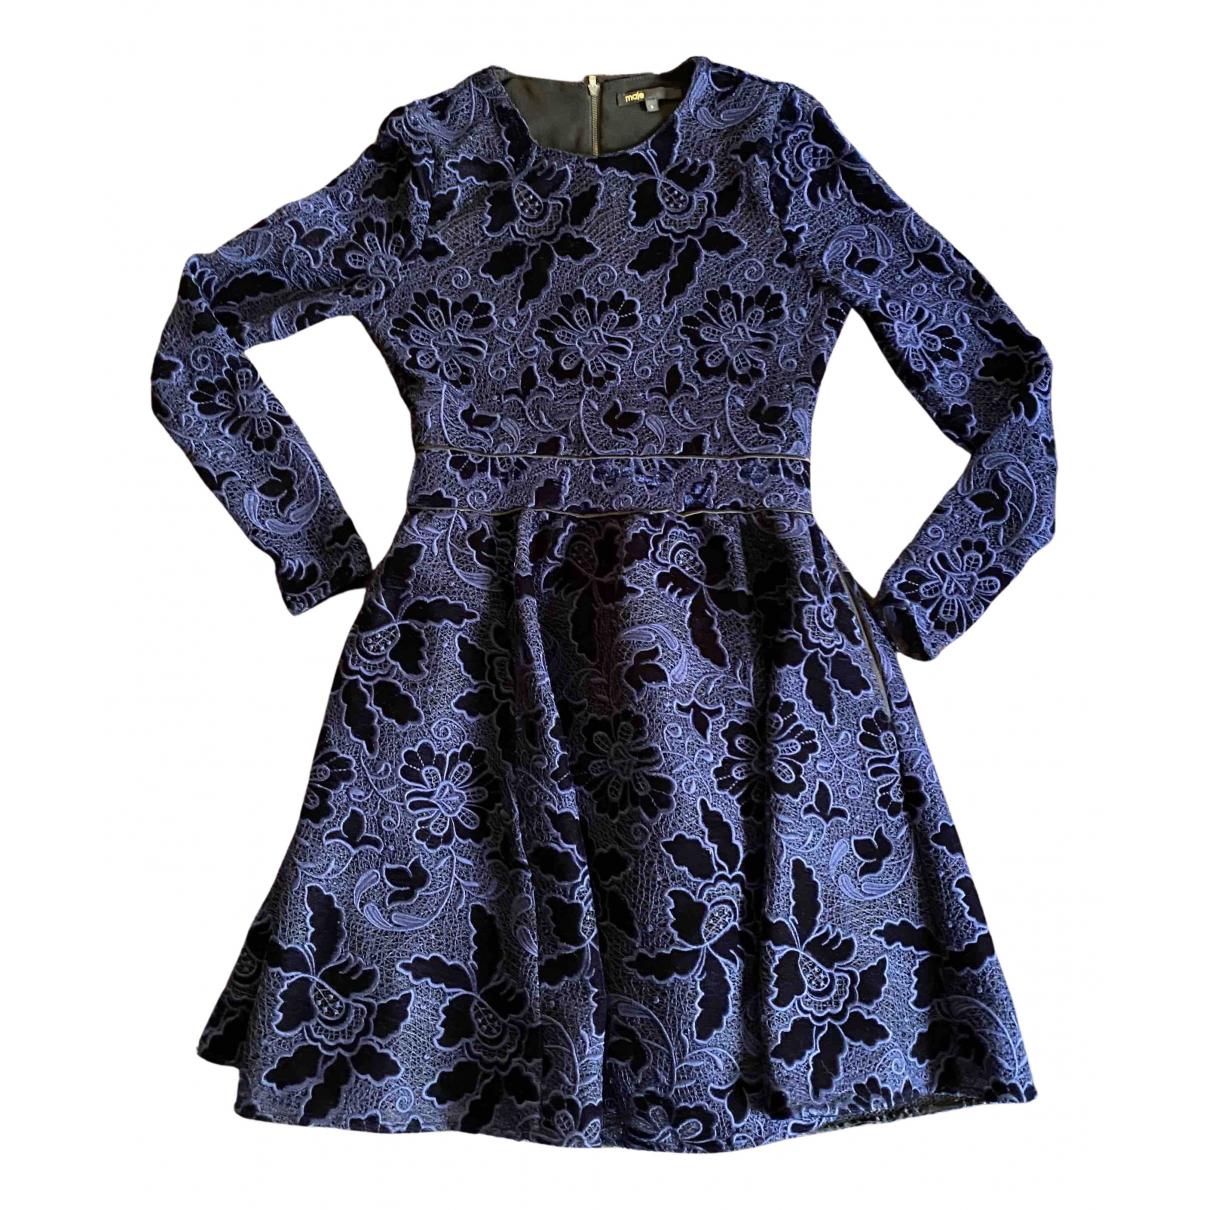 Maje \N Kleid in  Blau Synthetik